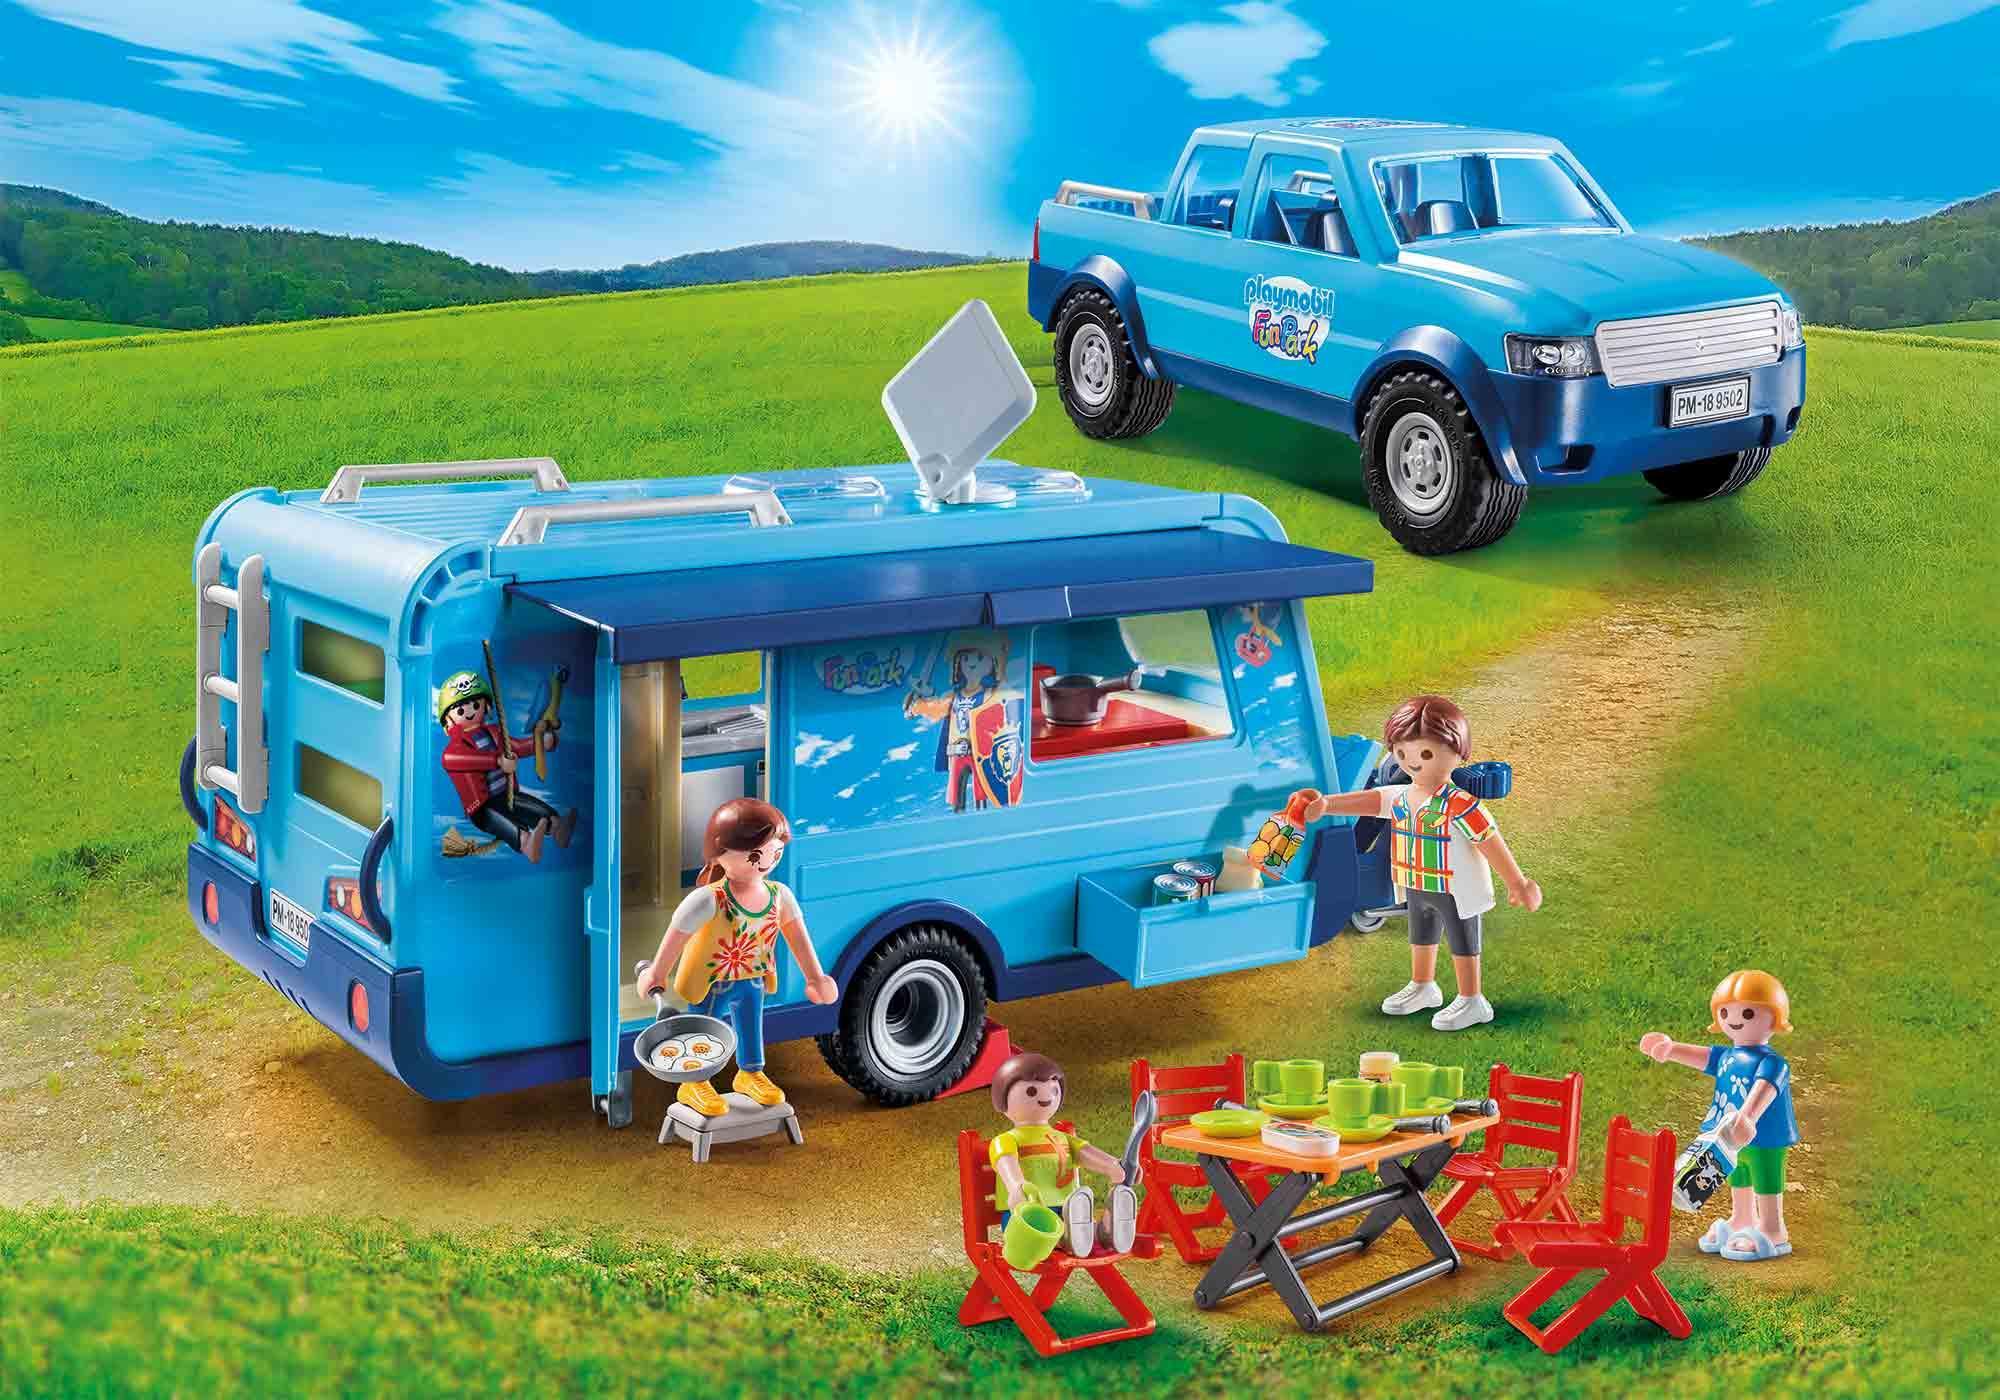 http://media.playmobil.com/i/playmobil/9502_product_detail/PLAYMOBIL-FunPark Pick-Up mit Wohnwagen